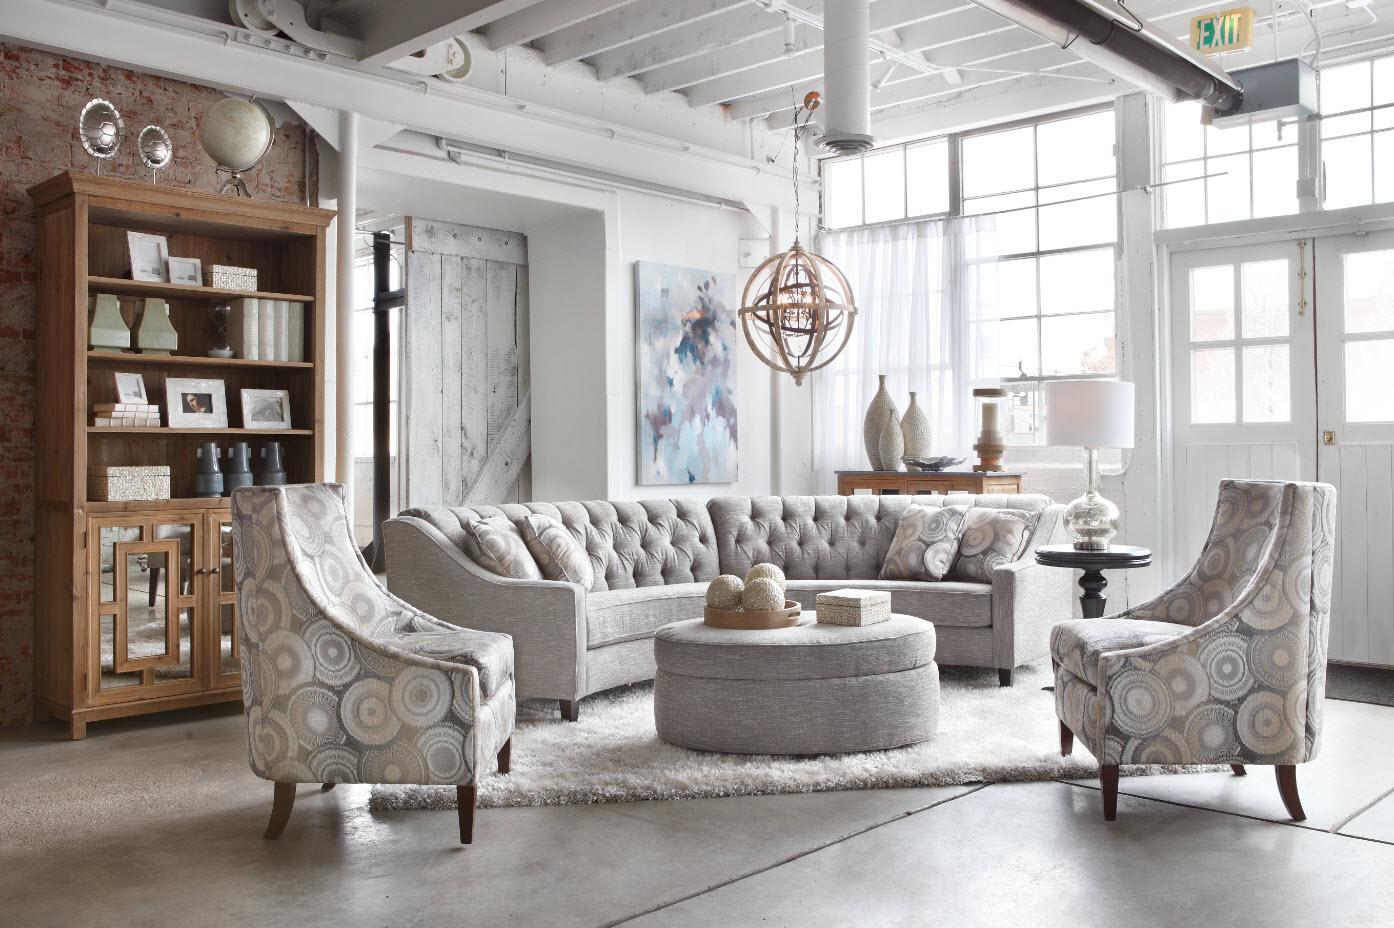 Furniture Row Austin Tx Www Furniturerow Com 512 302 0085